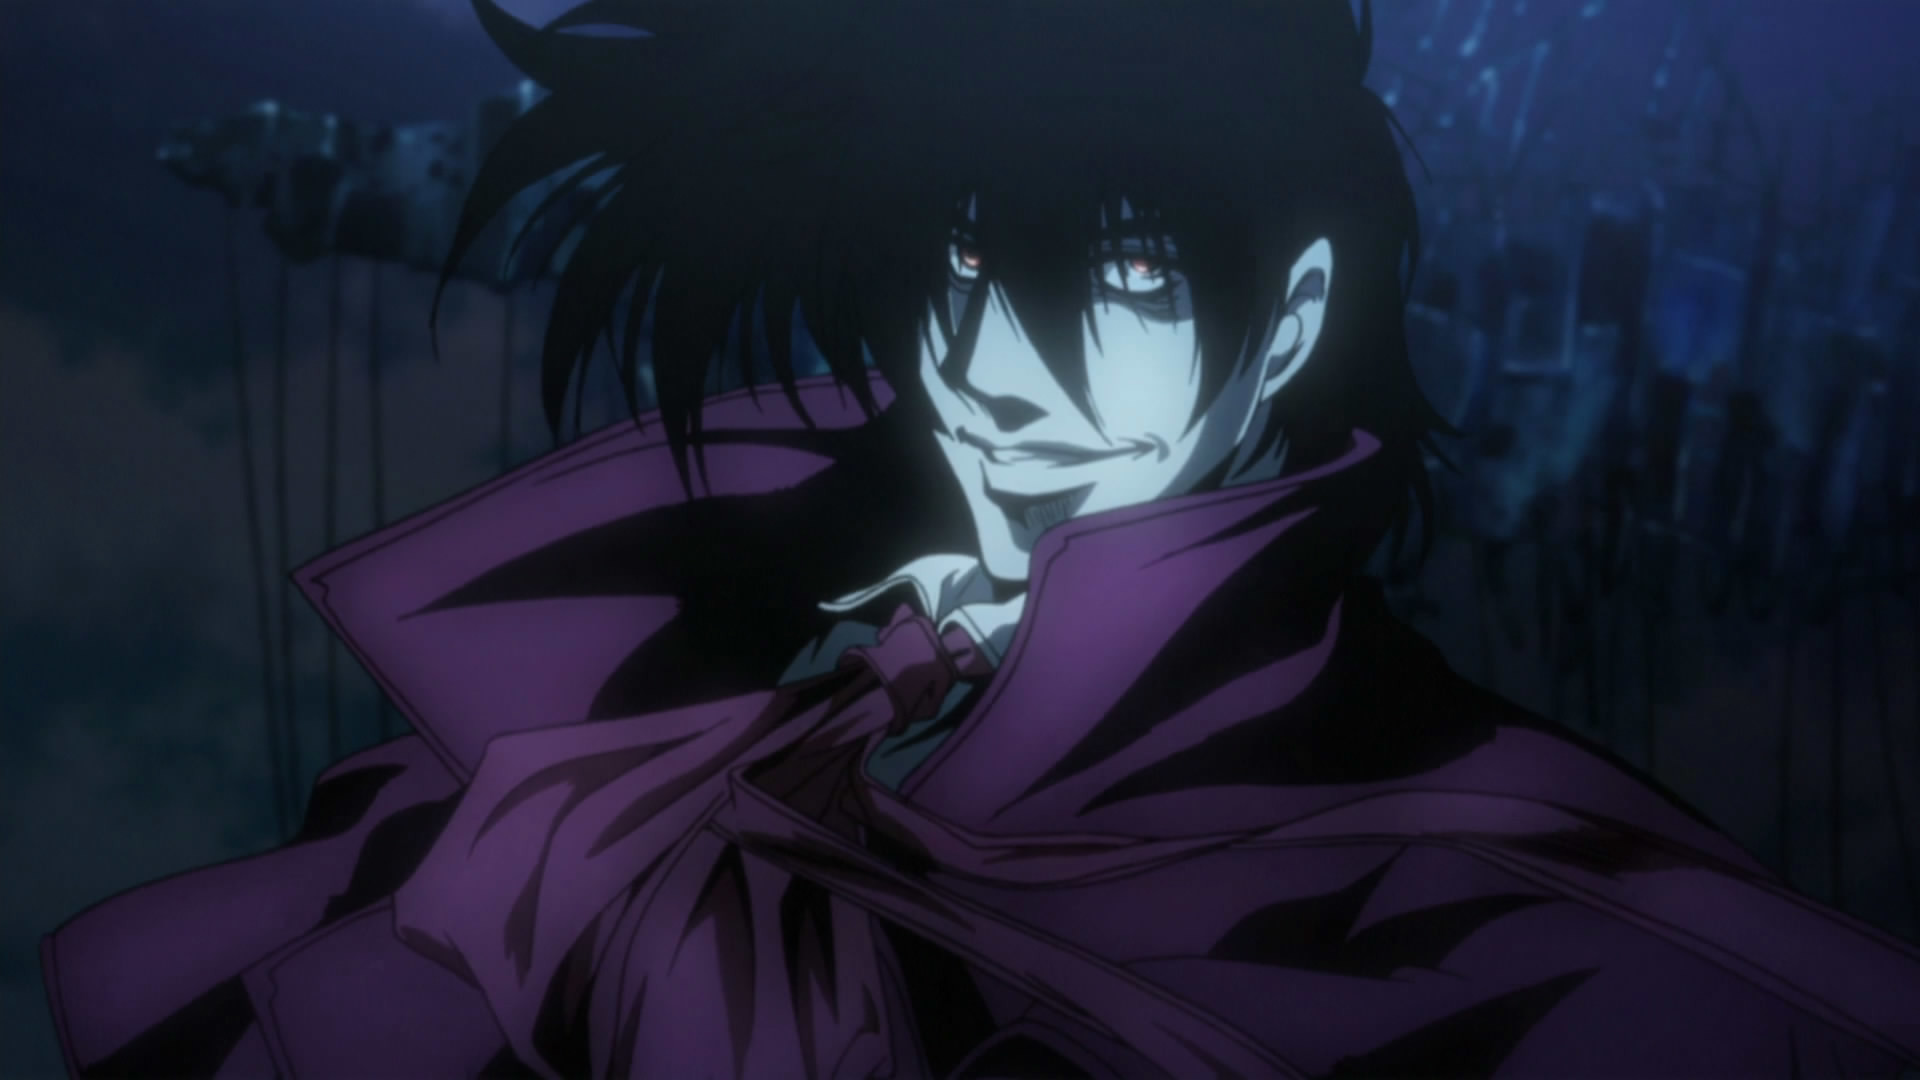 Image – Hellsing Ultimate OVA 06 -Blu-ray 1080p–AAC jpn–Sub  eng-fre-ger-rus- 20100406-21394889.jpg | Hellsing Wiki | FANDOM powered by  Wikia